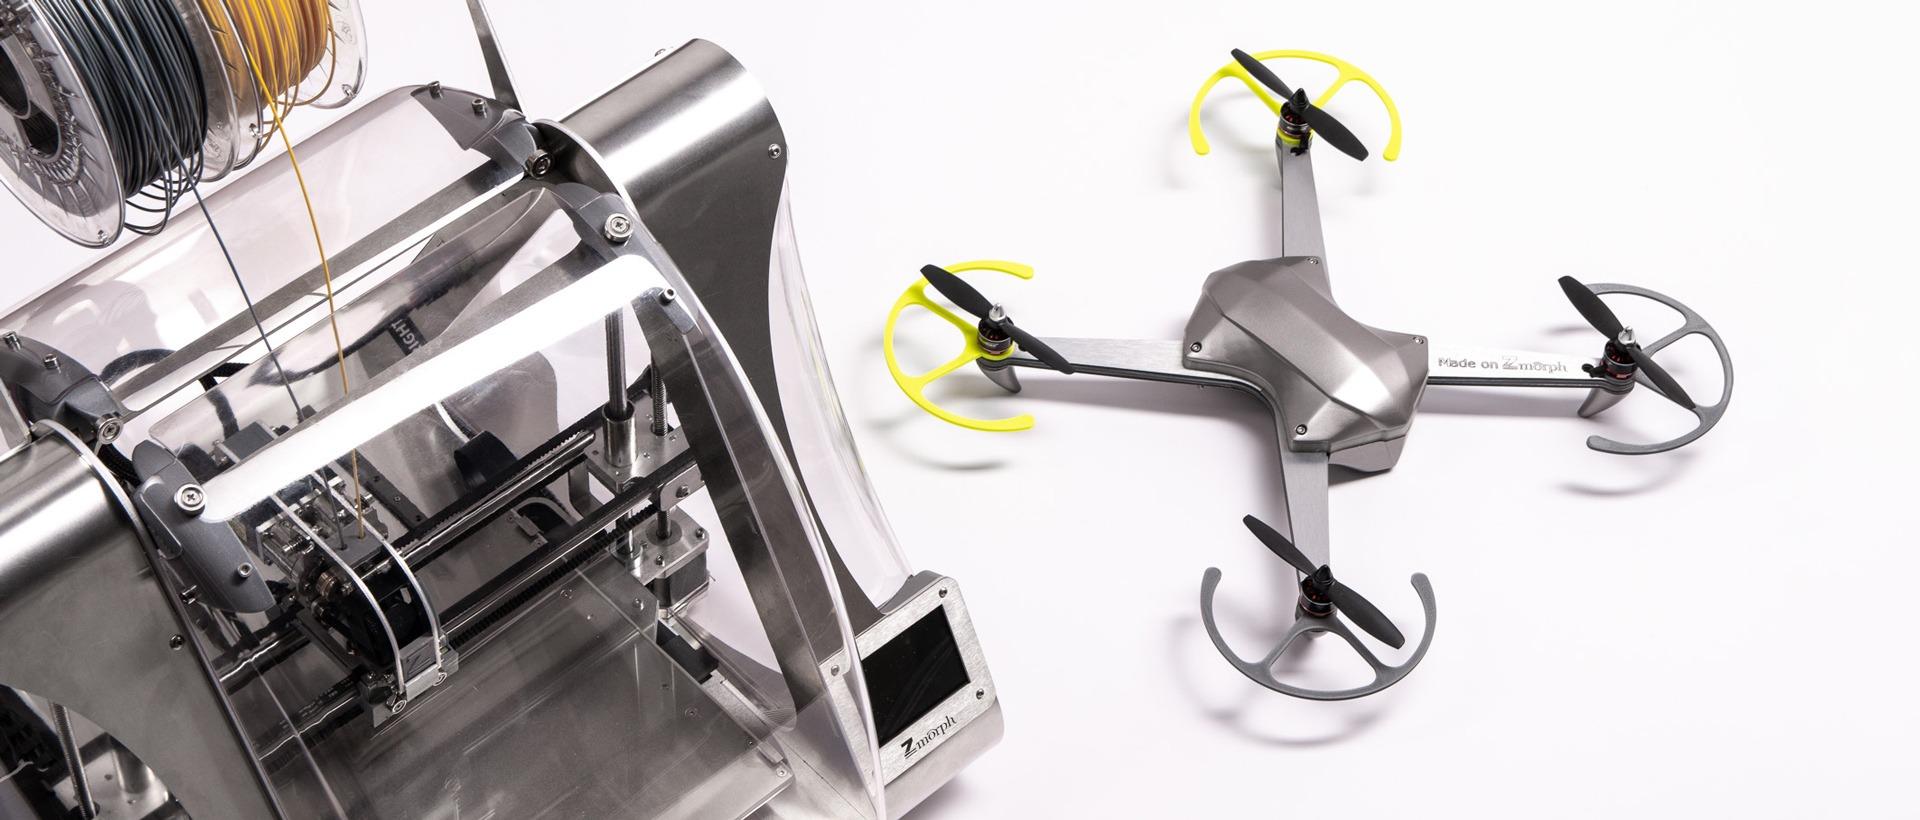 Zmorph VX Drone